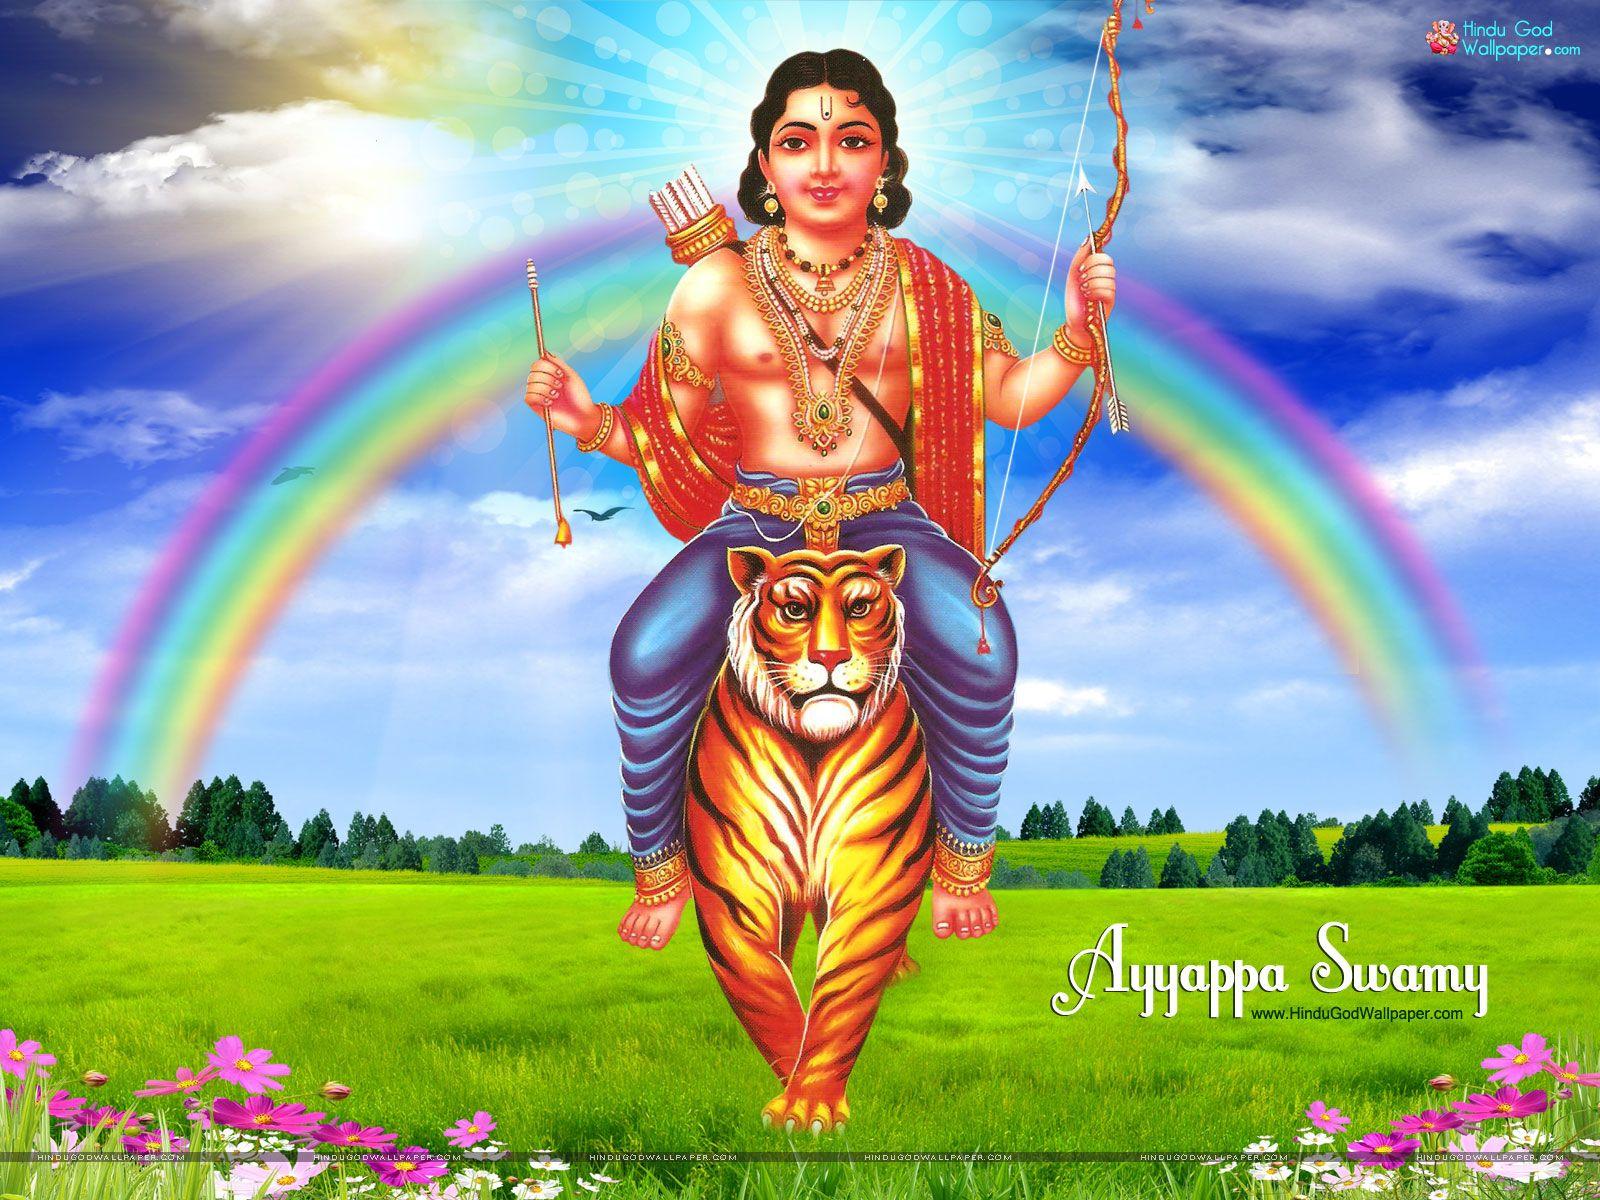 Fantastic Wallpaper High Quality Ayyappan - 697c42a75eafc691d35f42a76bae6b13  Perfect Image Reference_92773.jpg